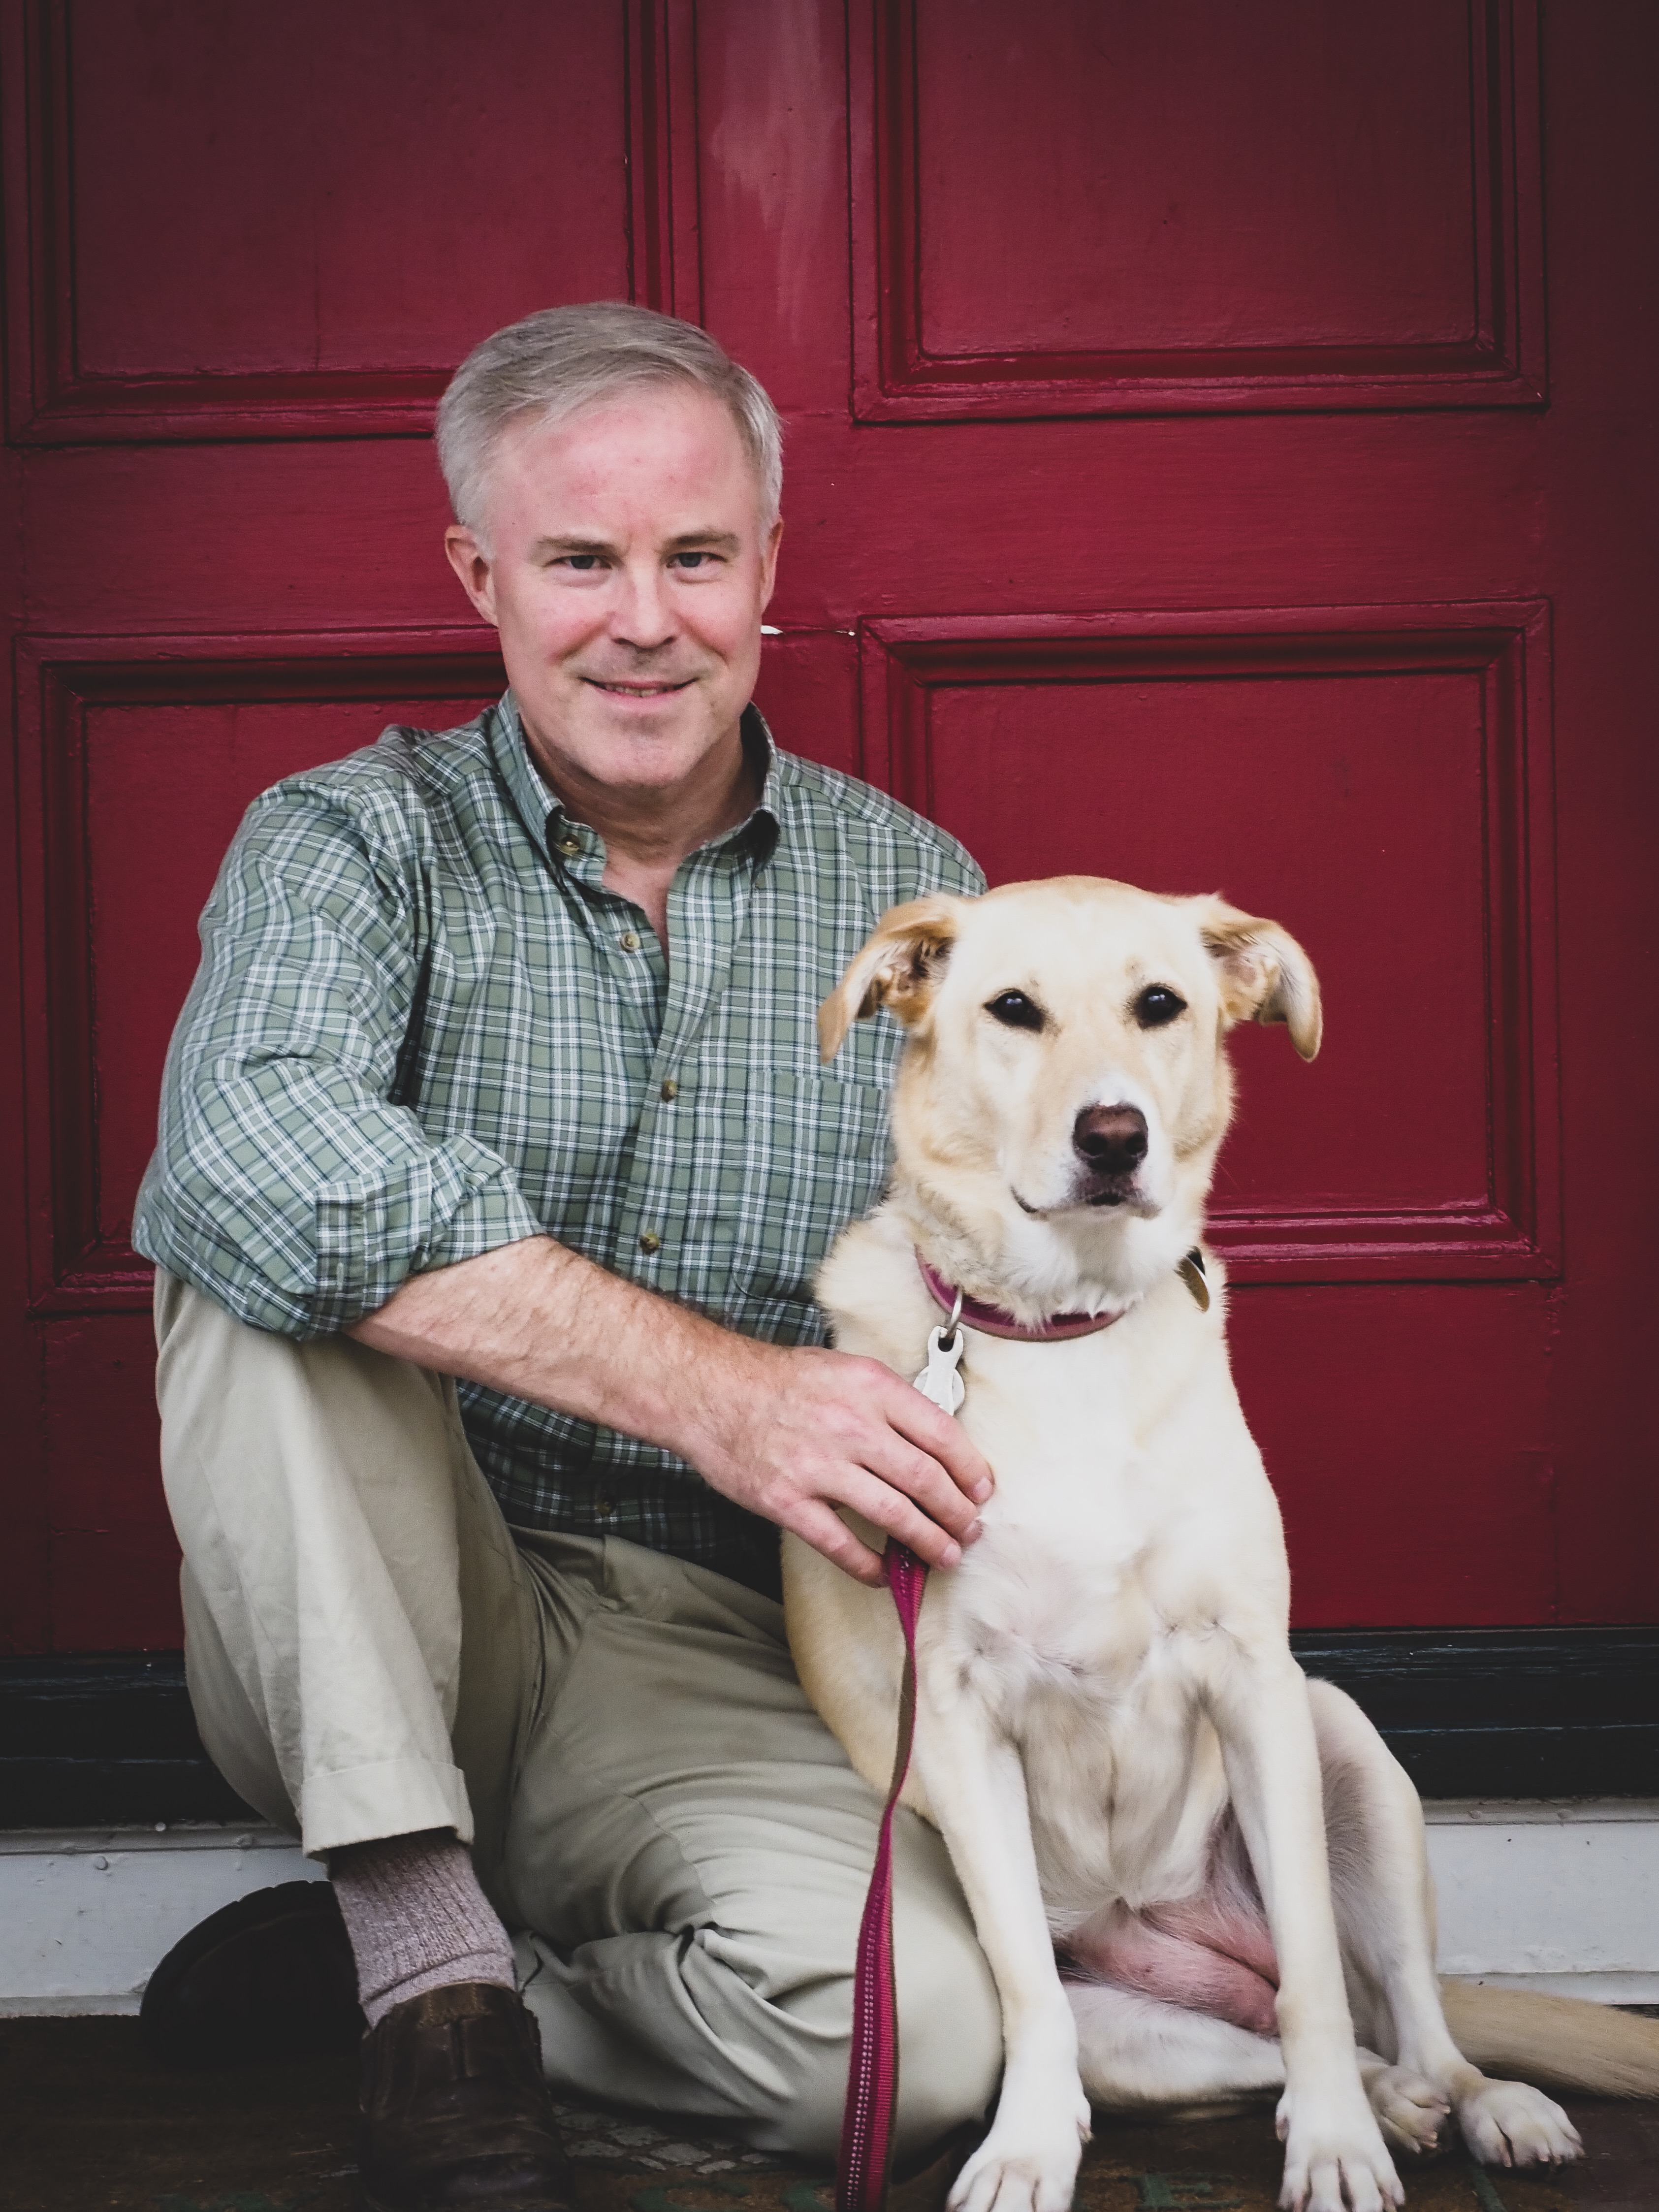 cressman with dog headshot